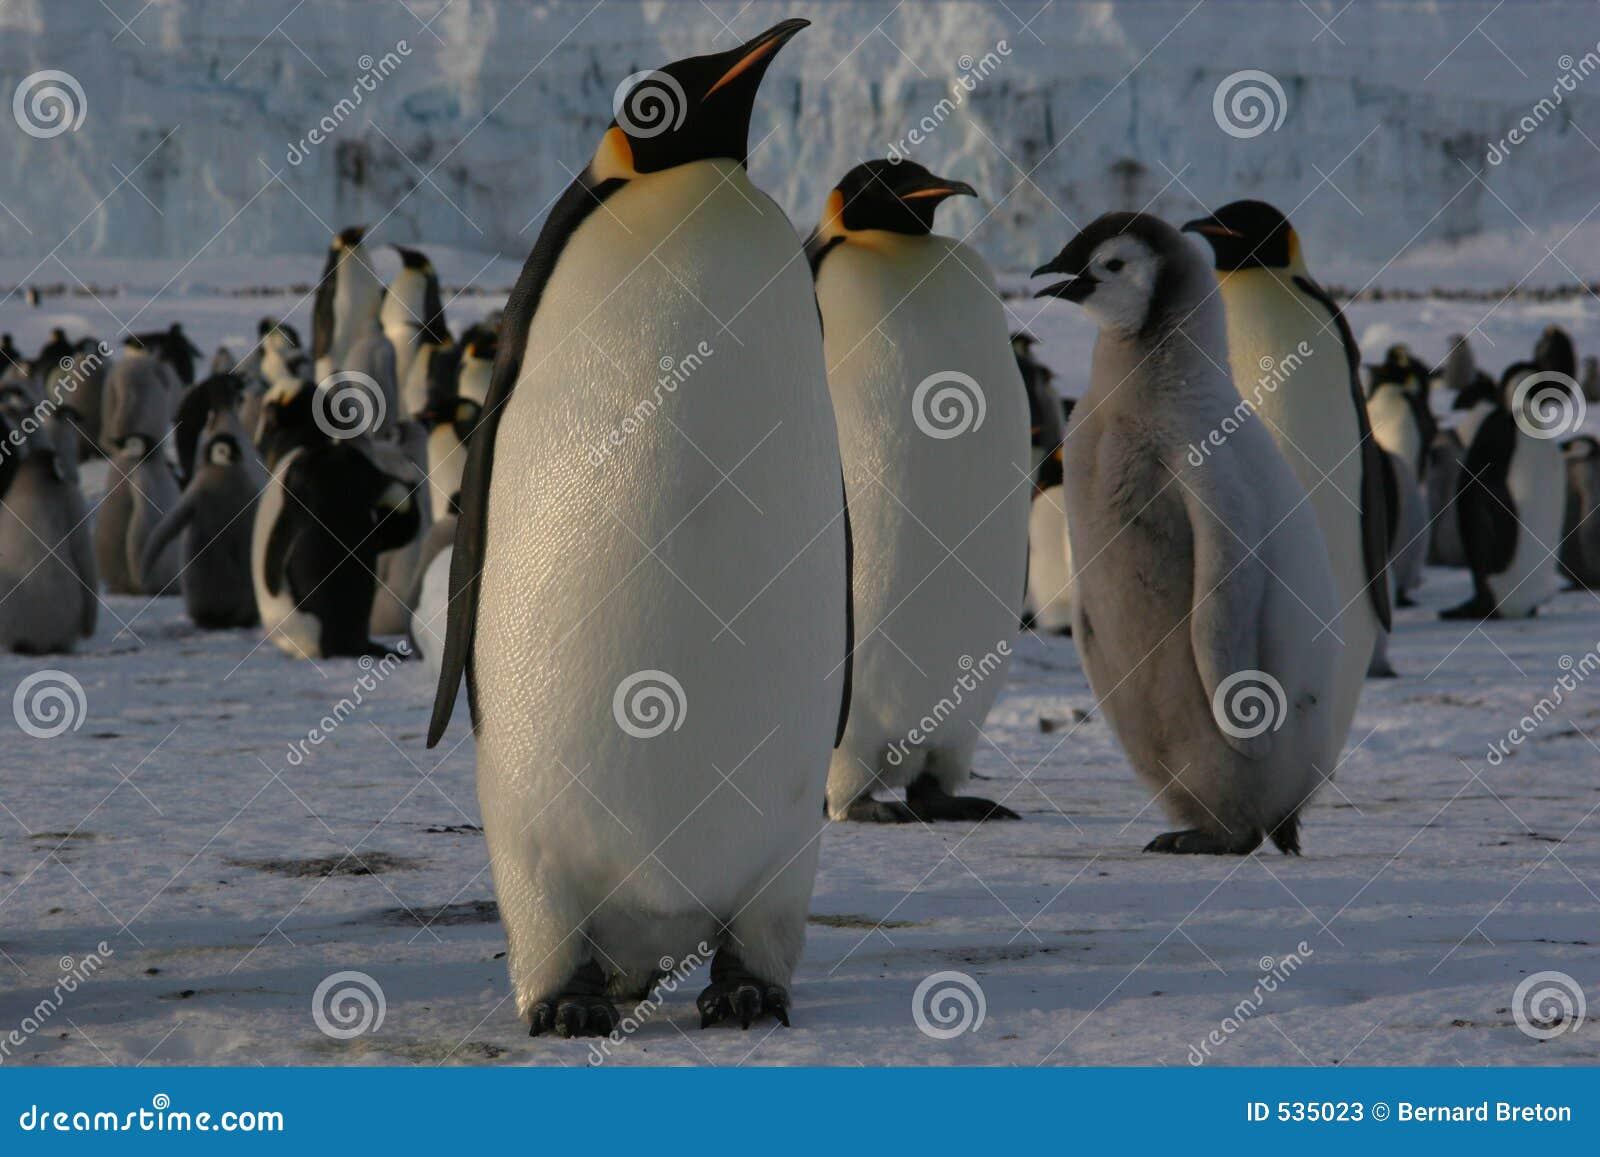 Download 皇企鹅 库存图片. 图片 包括有 antares, 冬天, 极性, 浮冰, 空白, 茴香, 罗斯, 企鹅, 敌意 - 535023